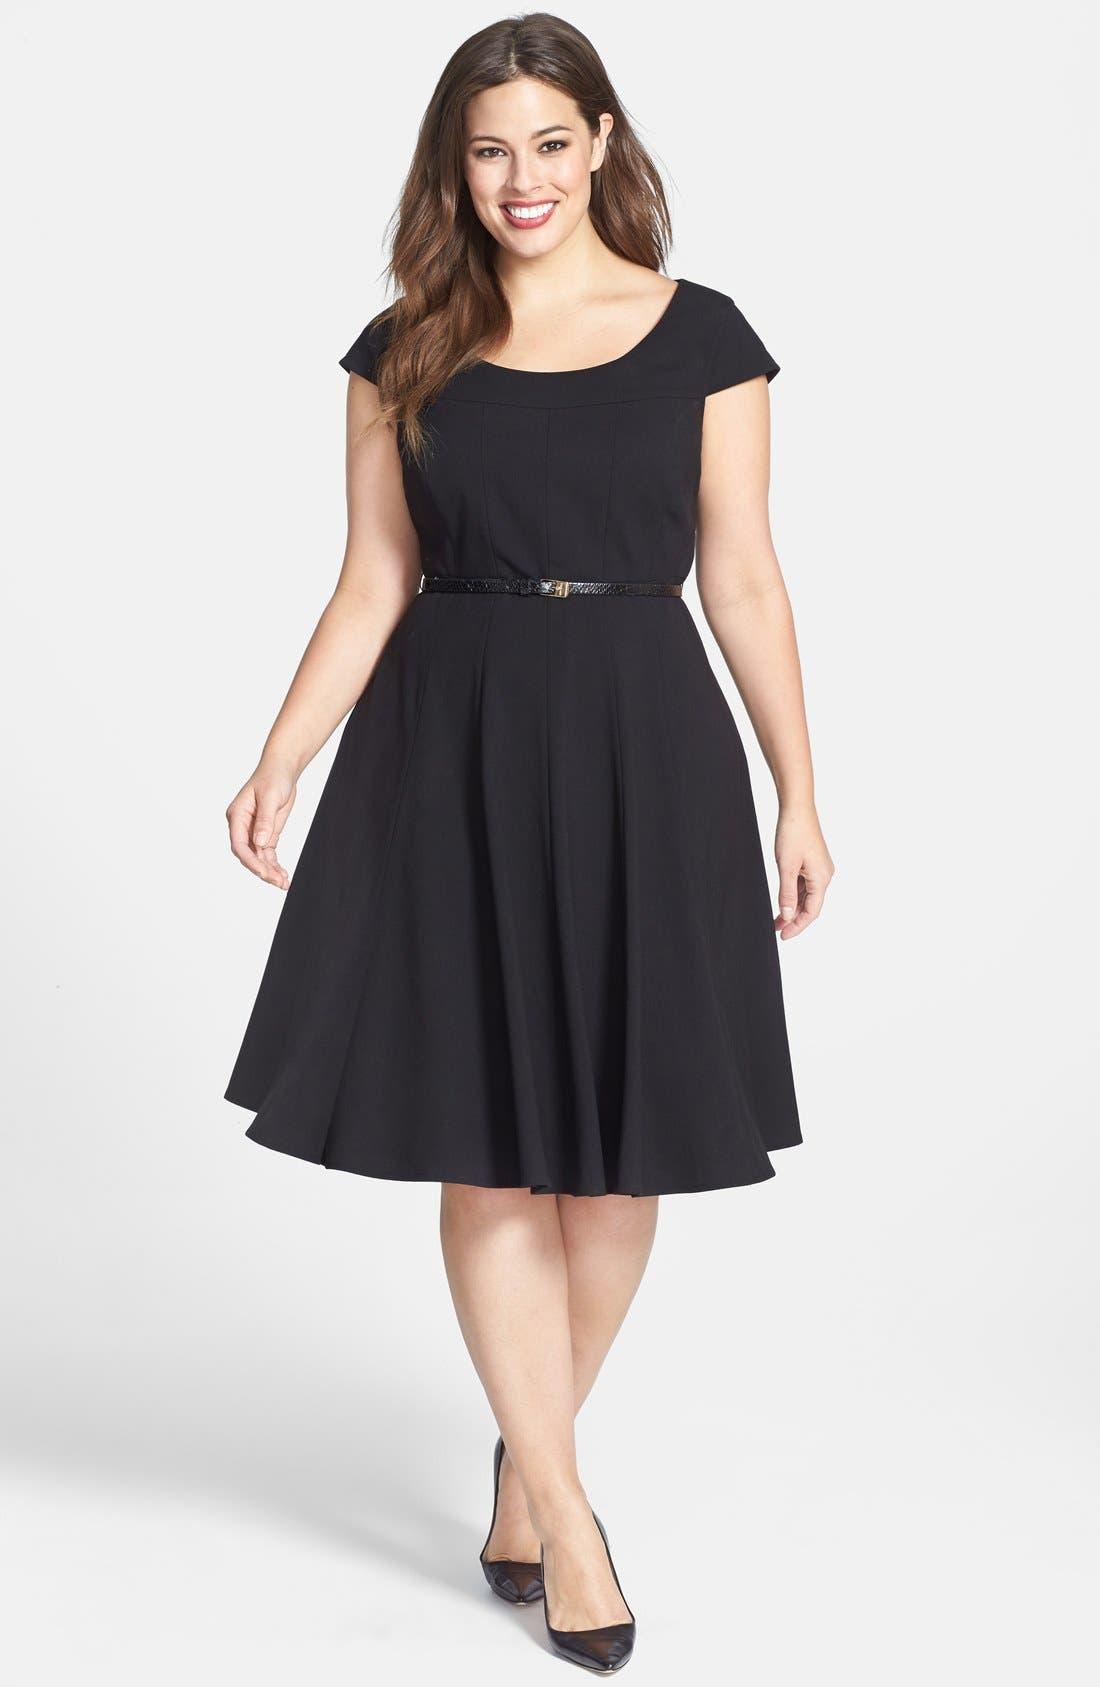 Alternate Image 1 Selected - Calvin Klein Cap Sleeve Fit & Flare Dress (Plus Size)